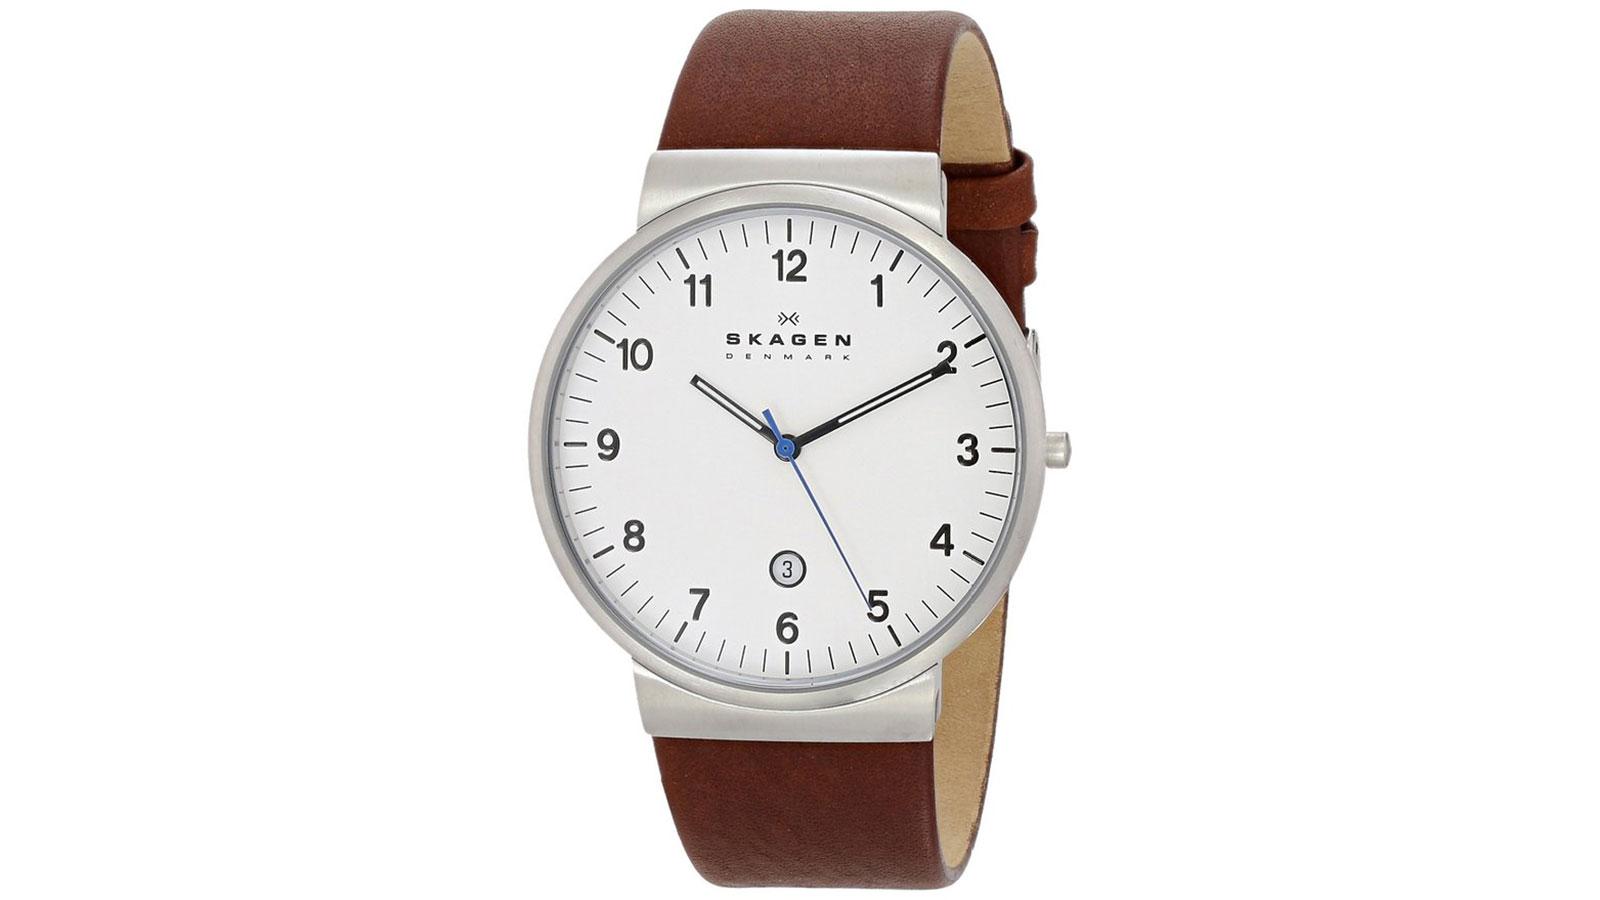 Skagen Klassik Men's Three-Hand Leather Watch   best men's watches under $100